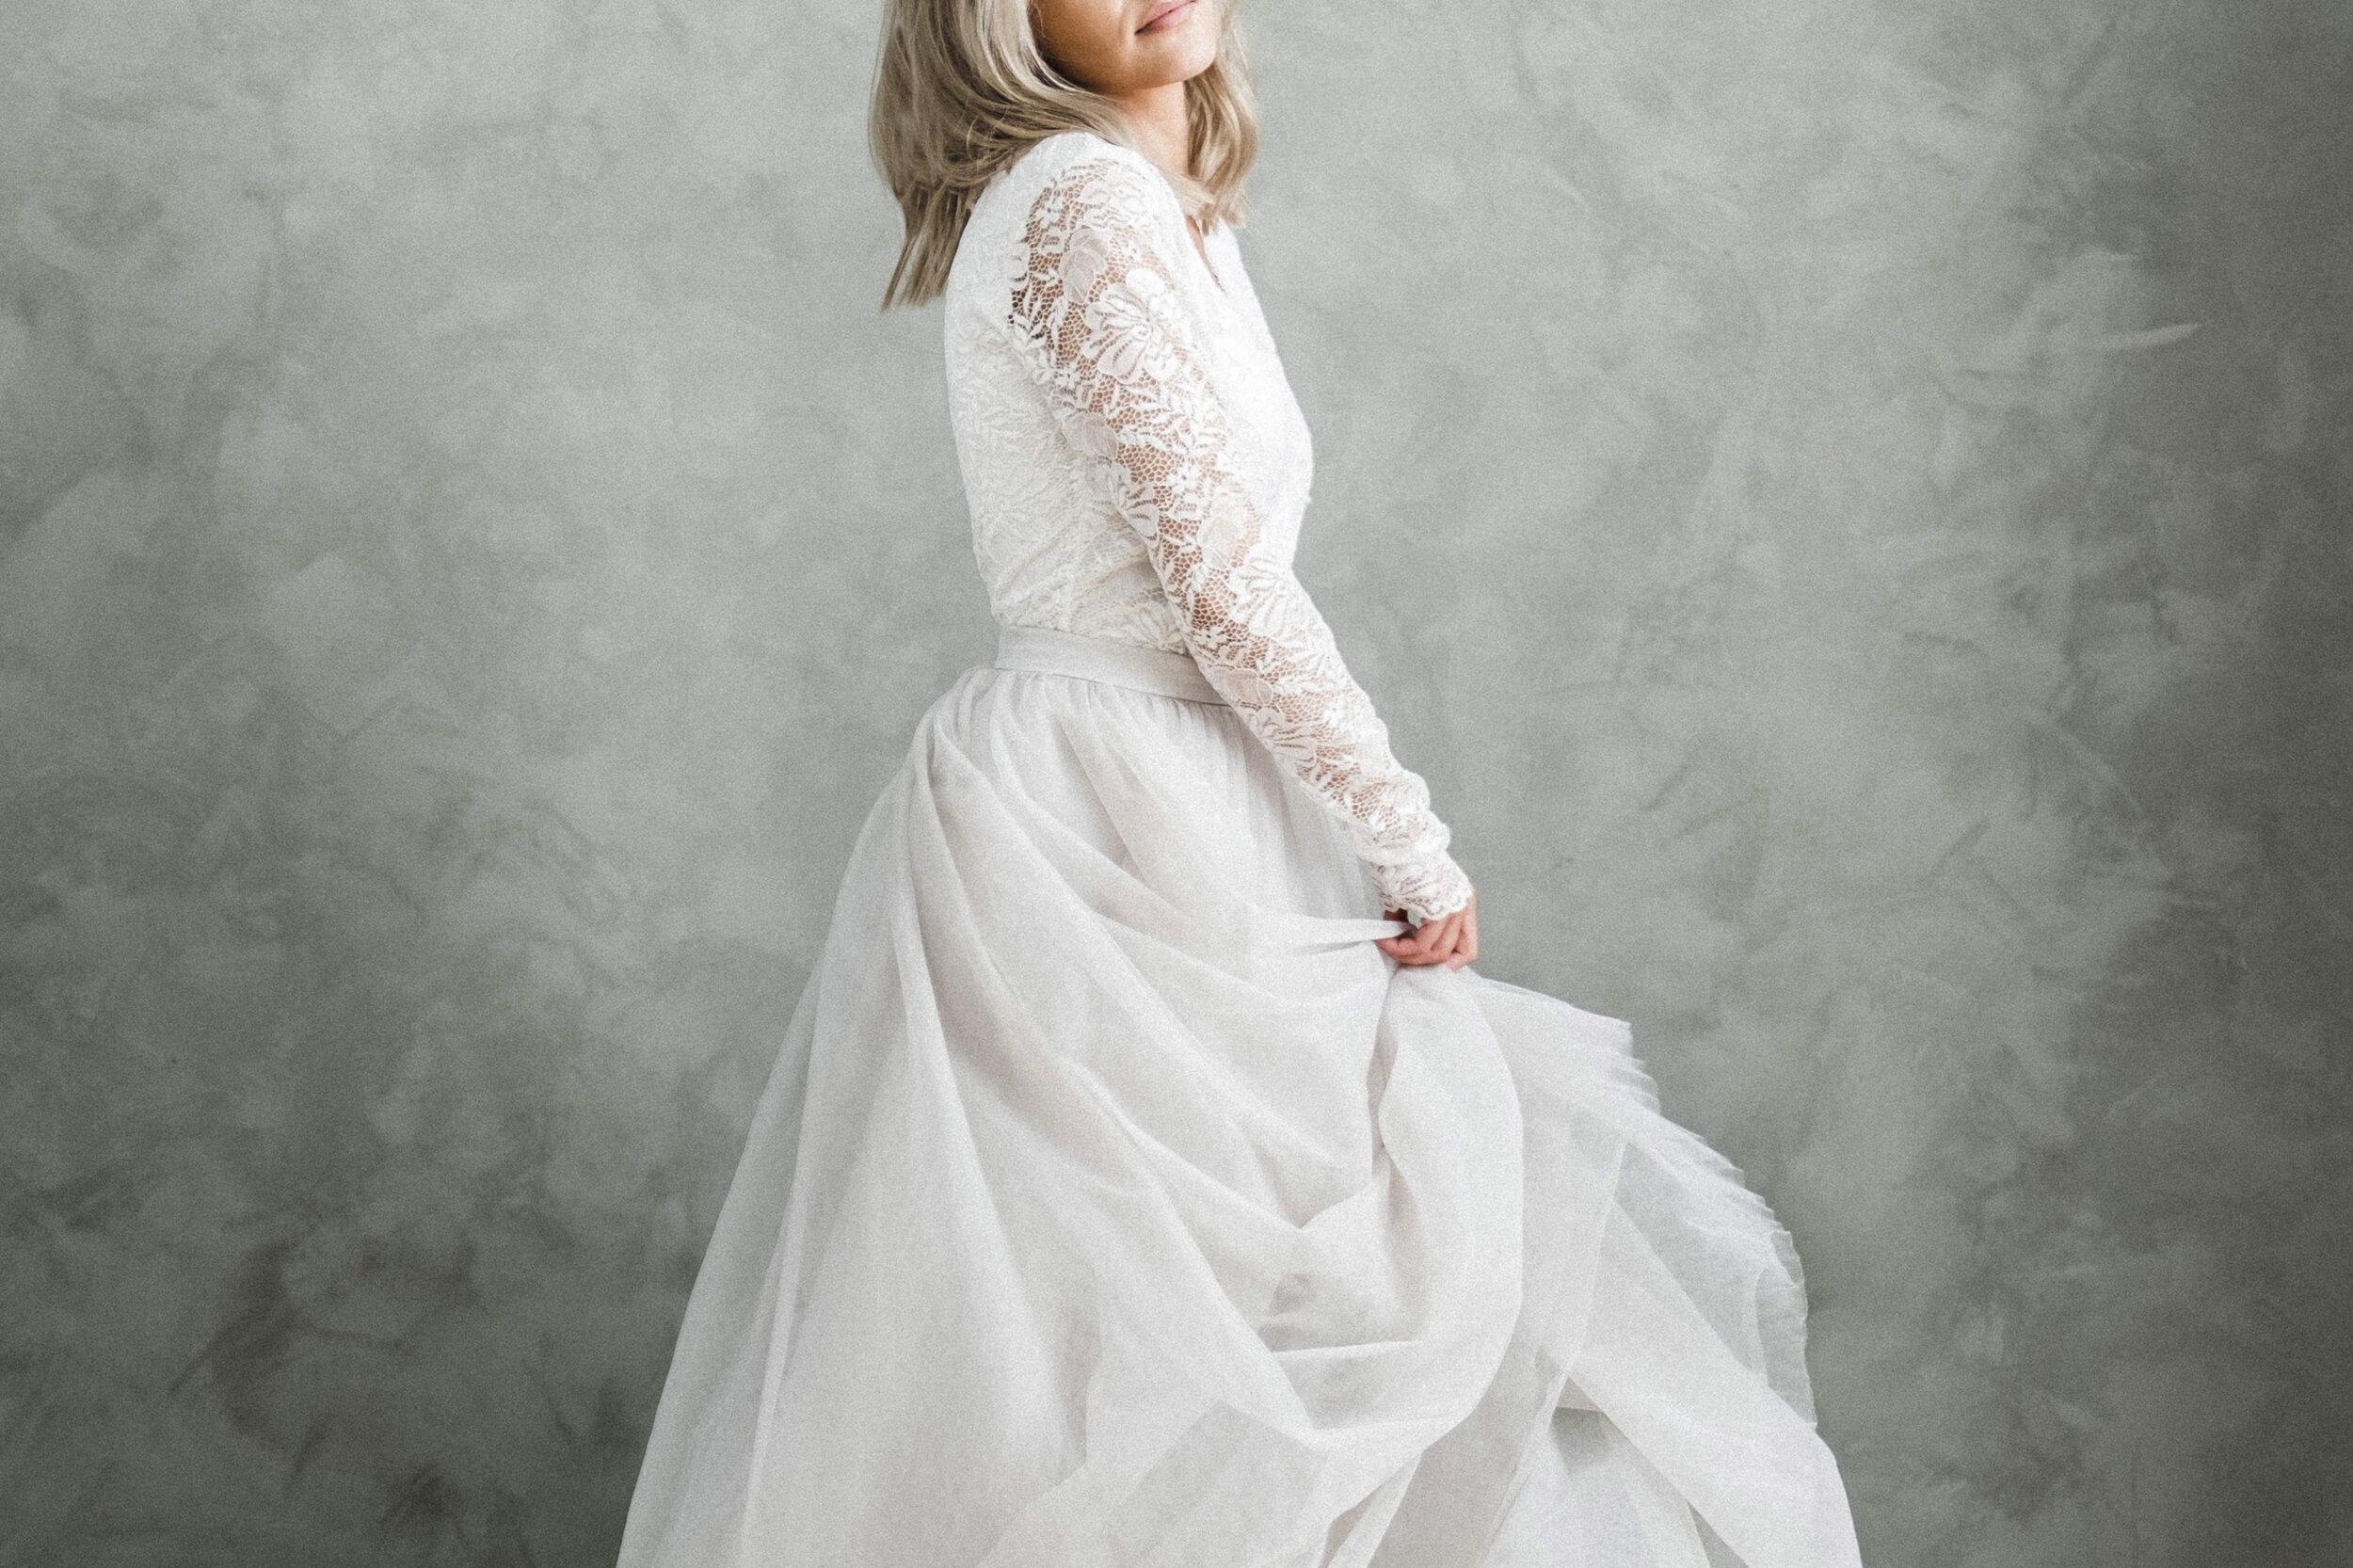 Bröllopsklänning Östersund